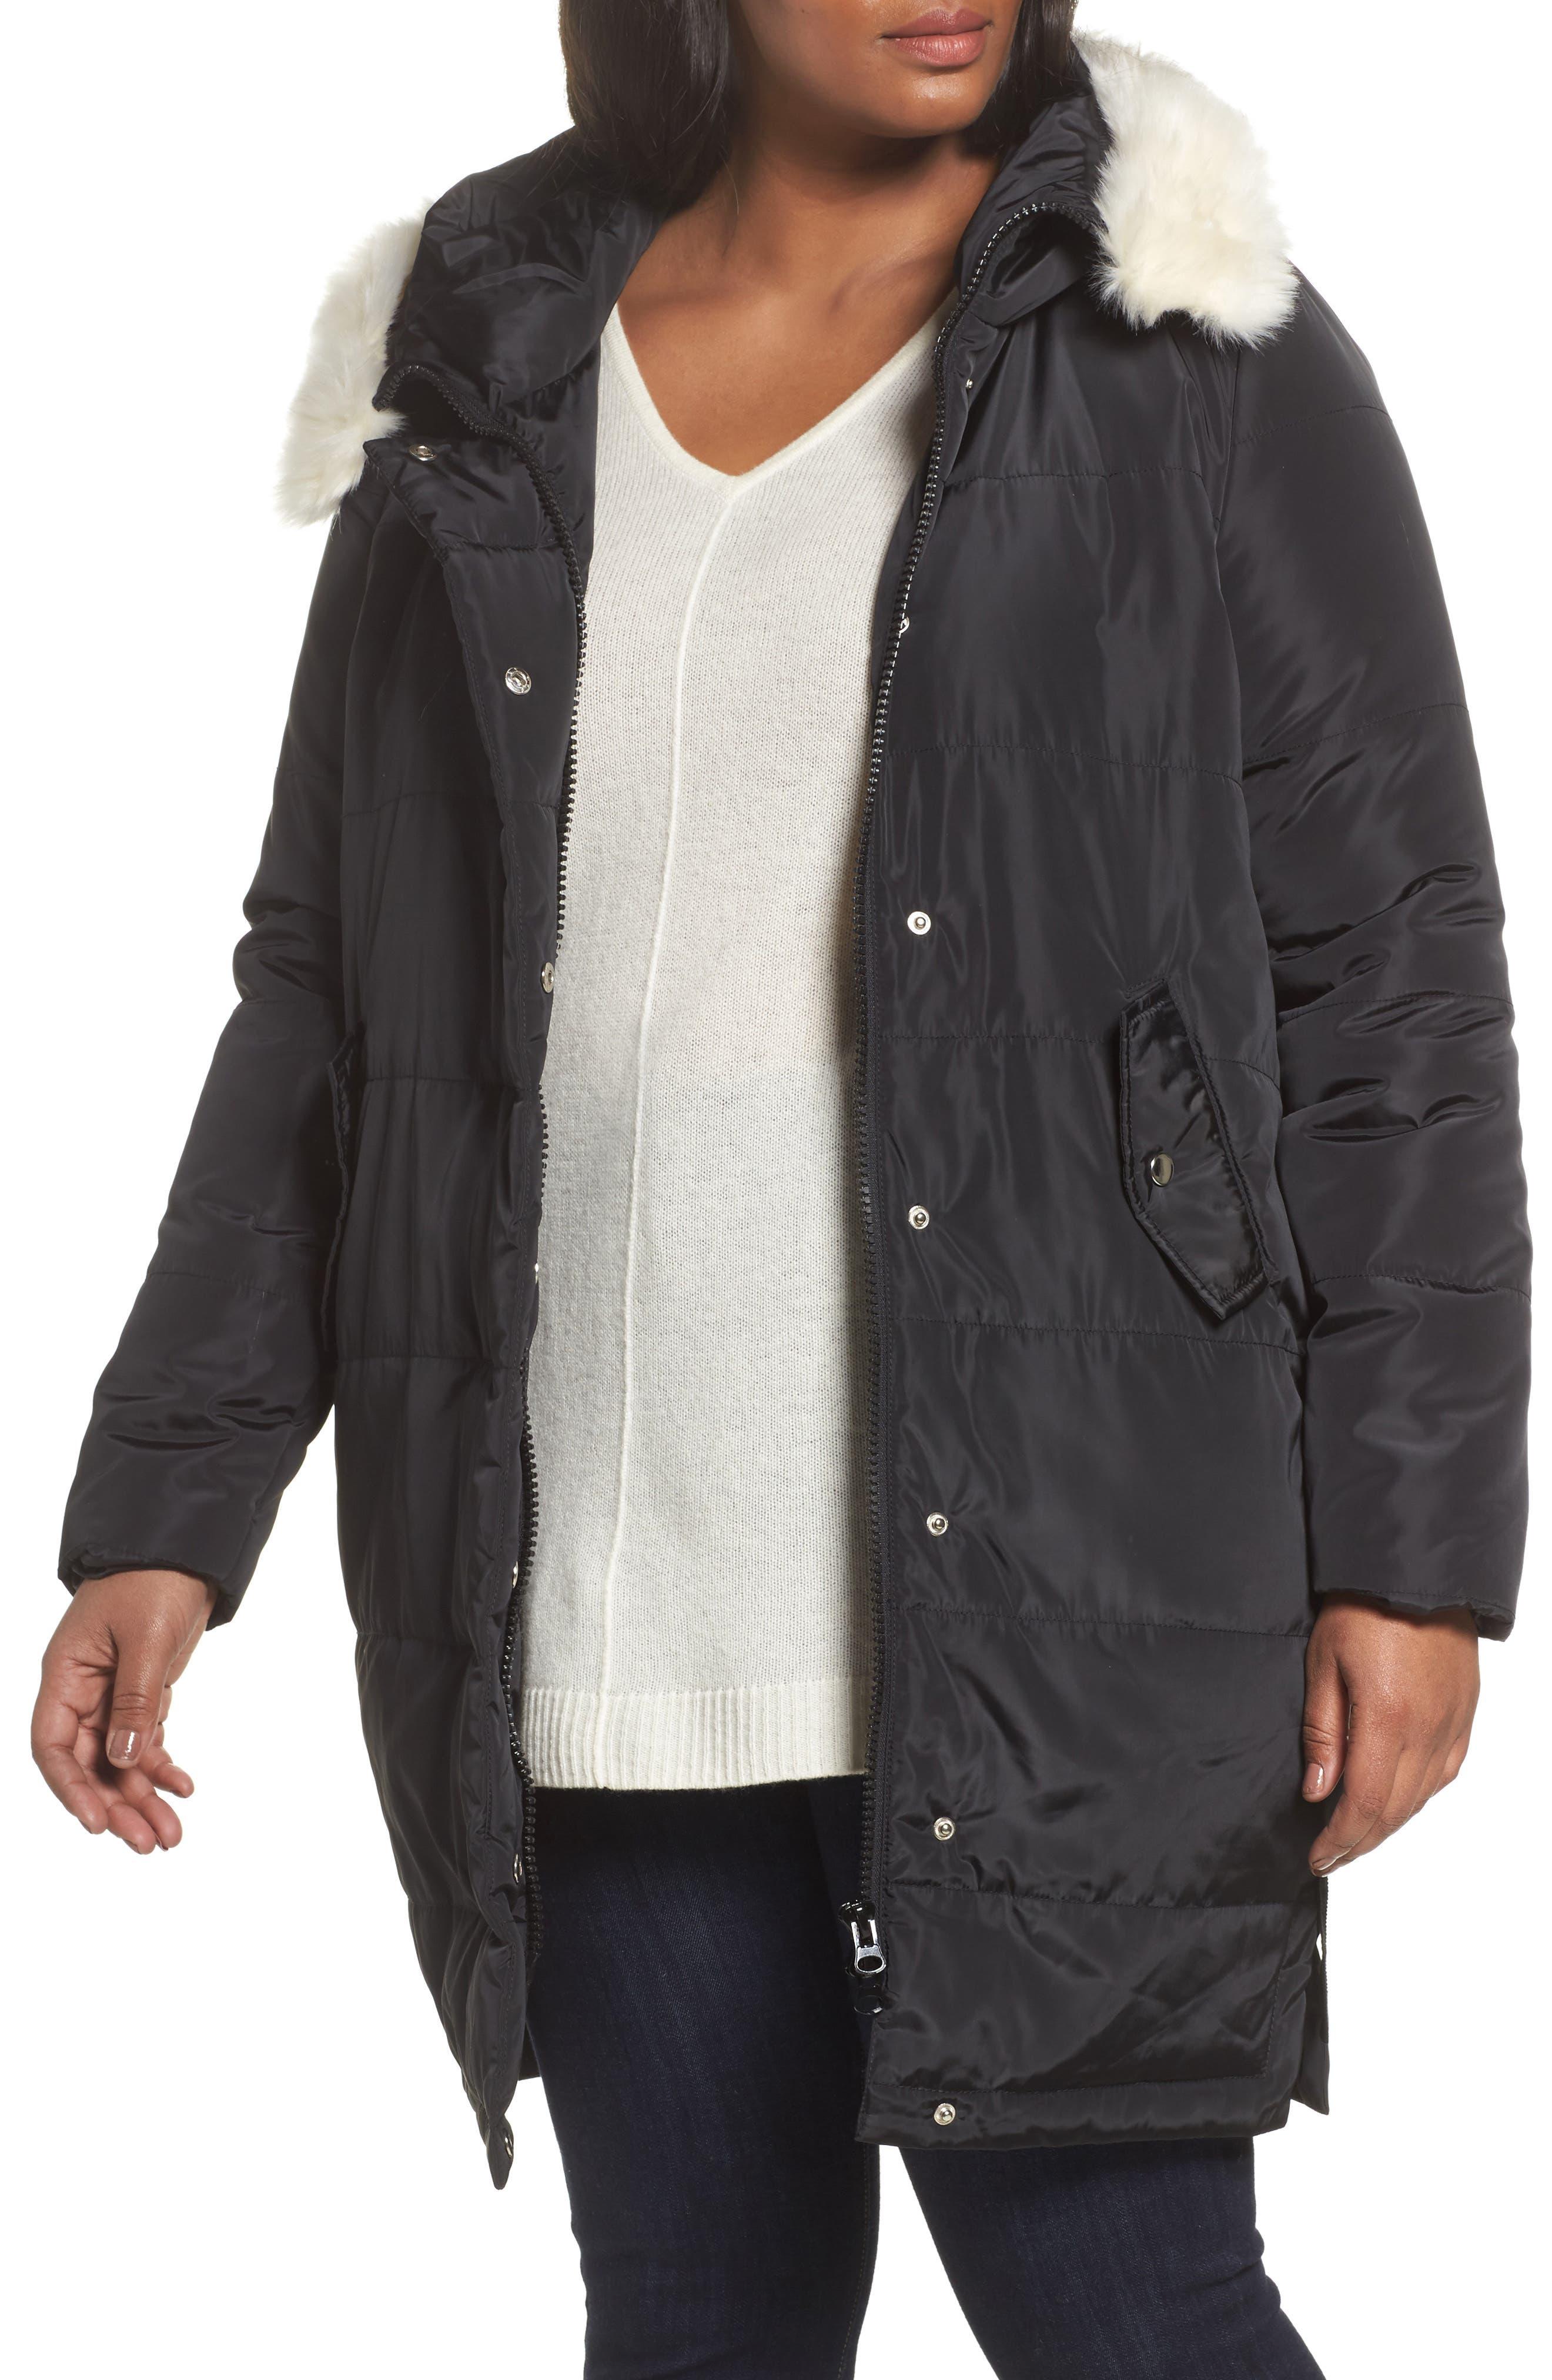 Puffer Coat with Faux Fur Trim,                             Main thumbnail 1, color,                             Black